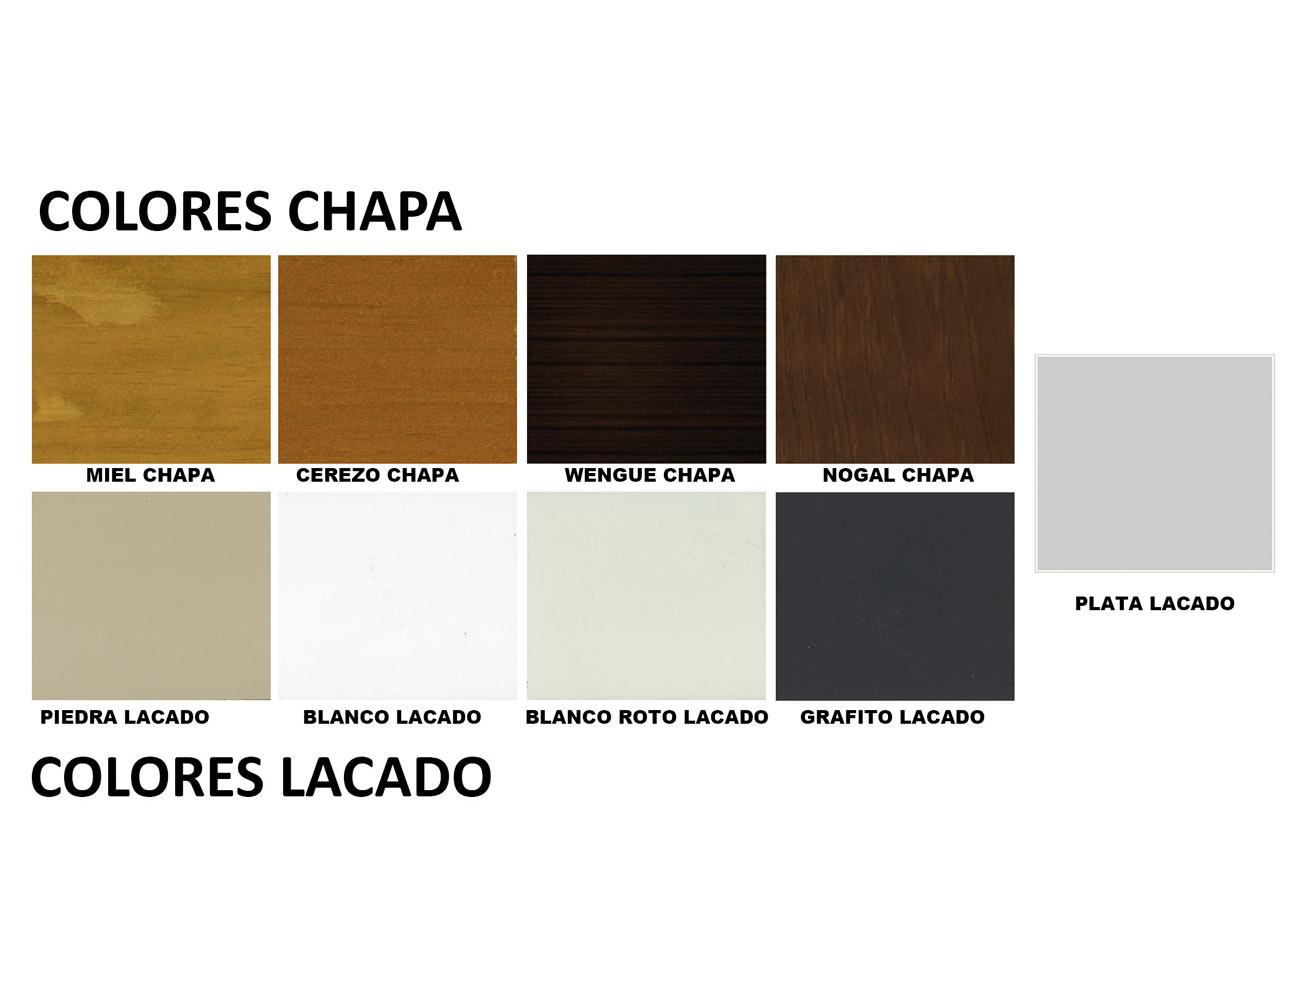 Colores224